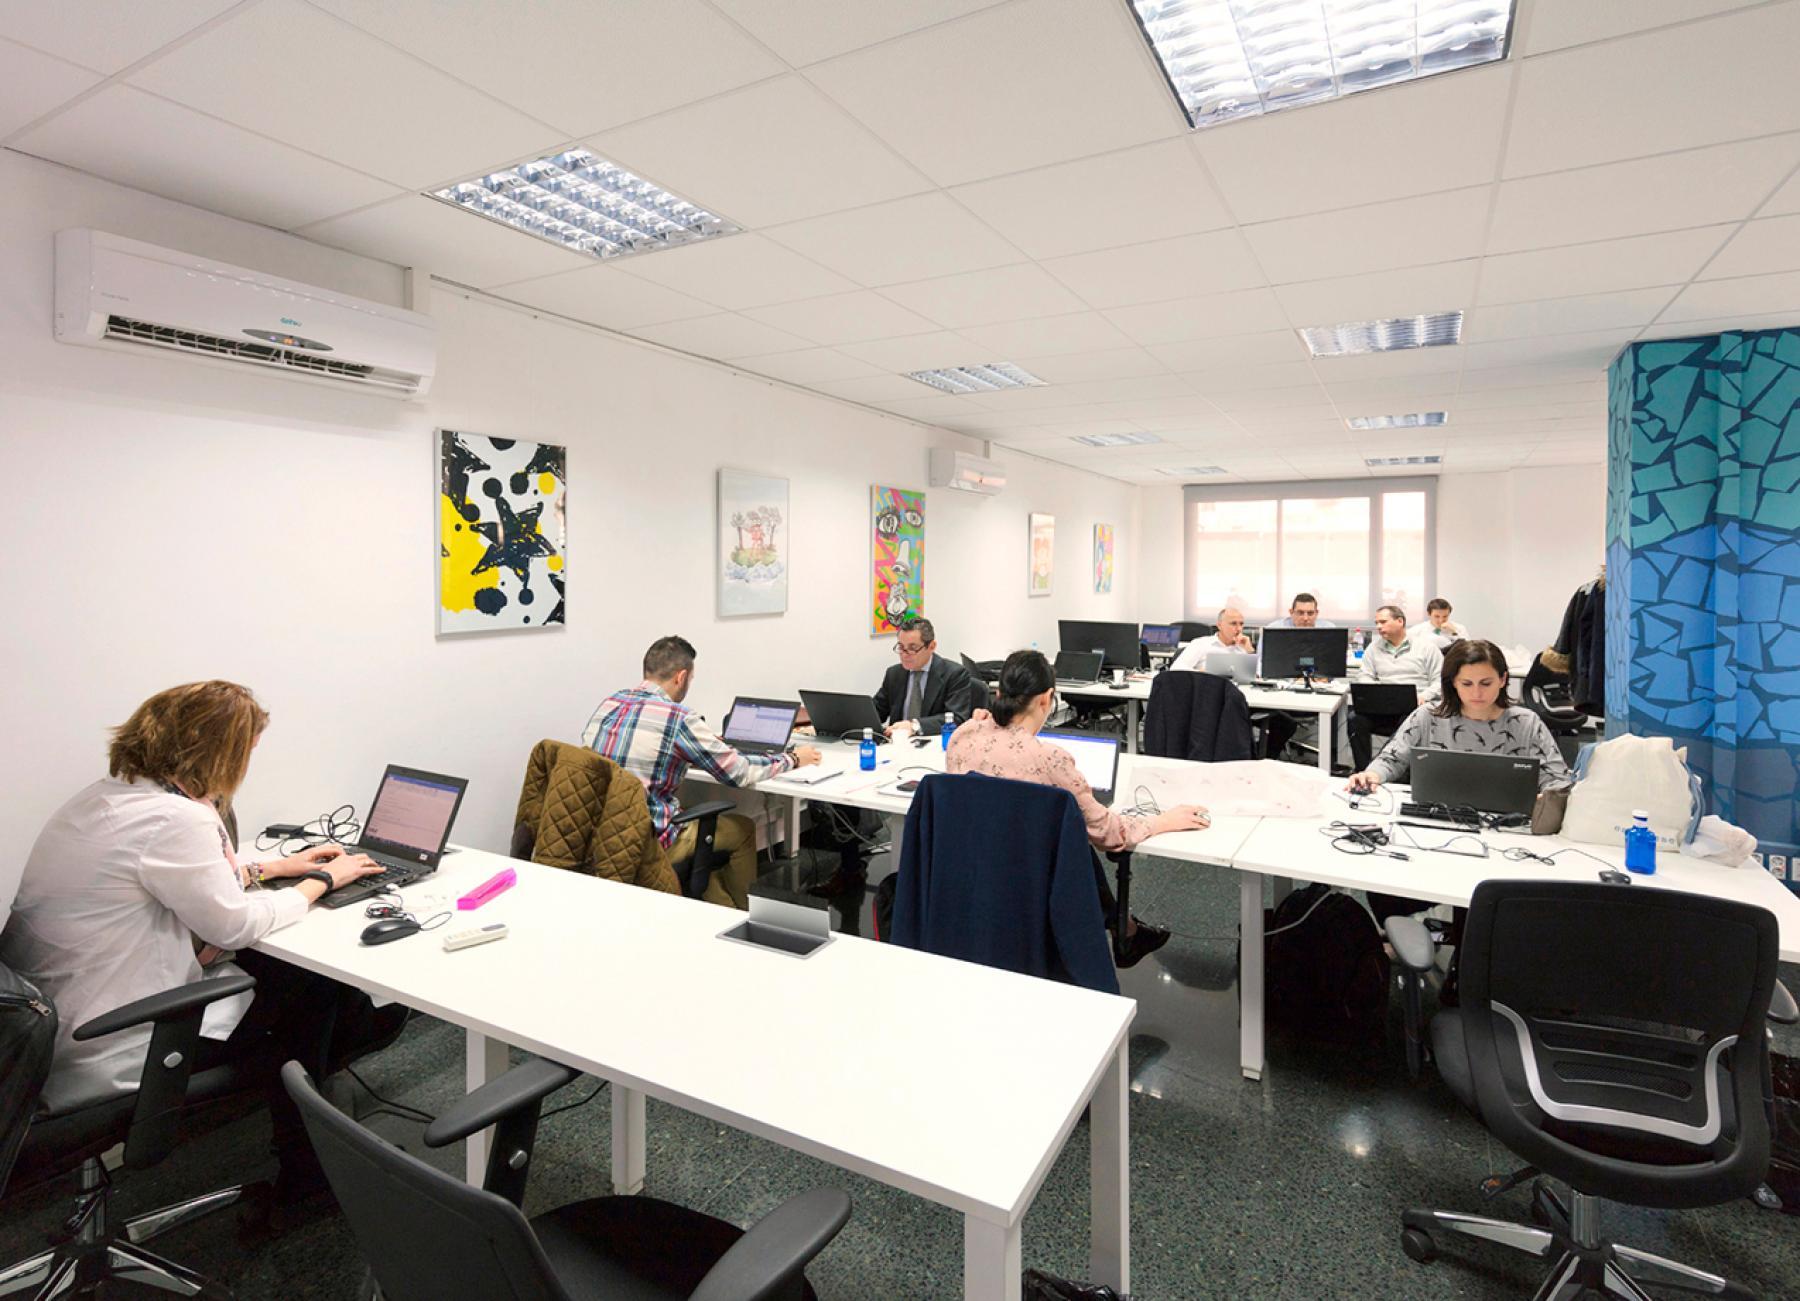 Rent office space Carrer de Provença 385, Barcelona (8)